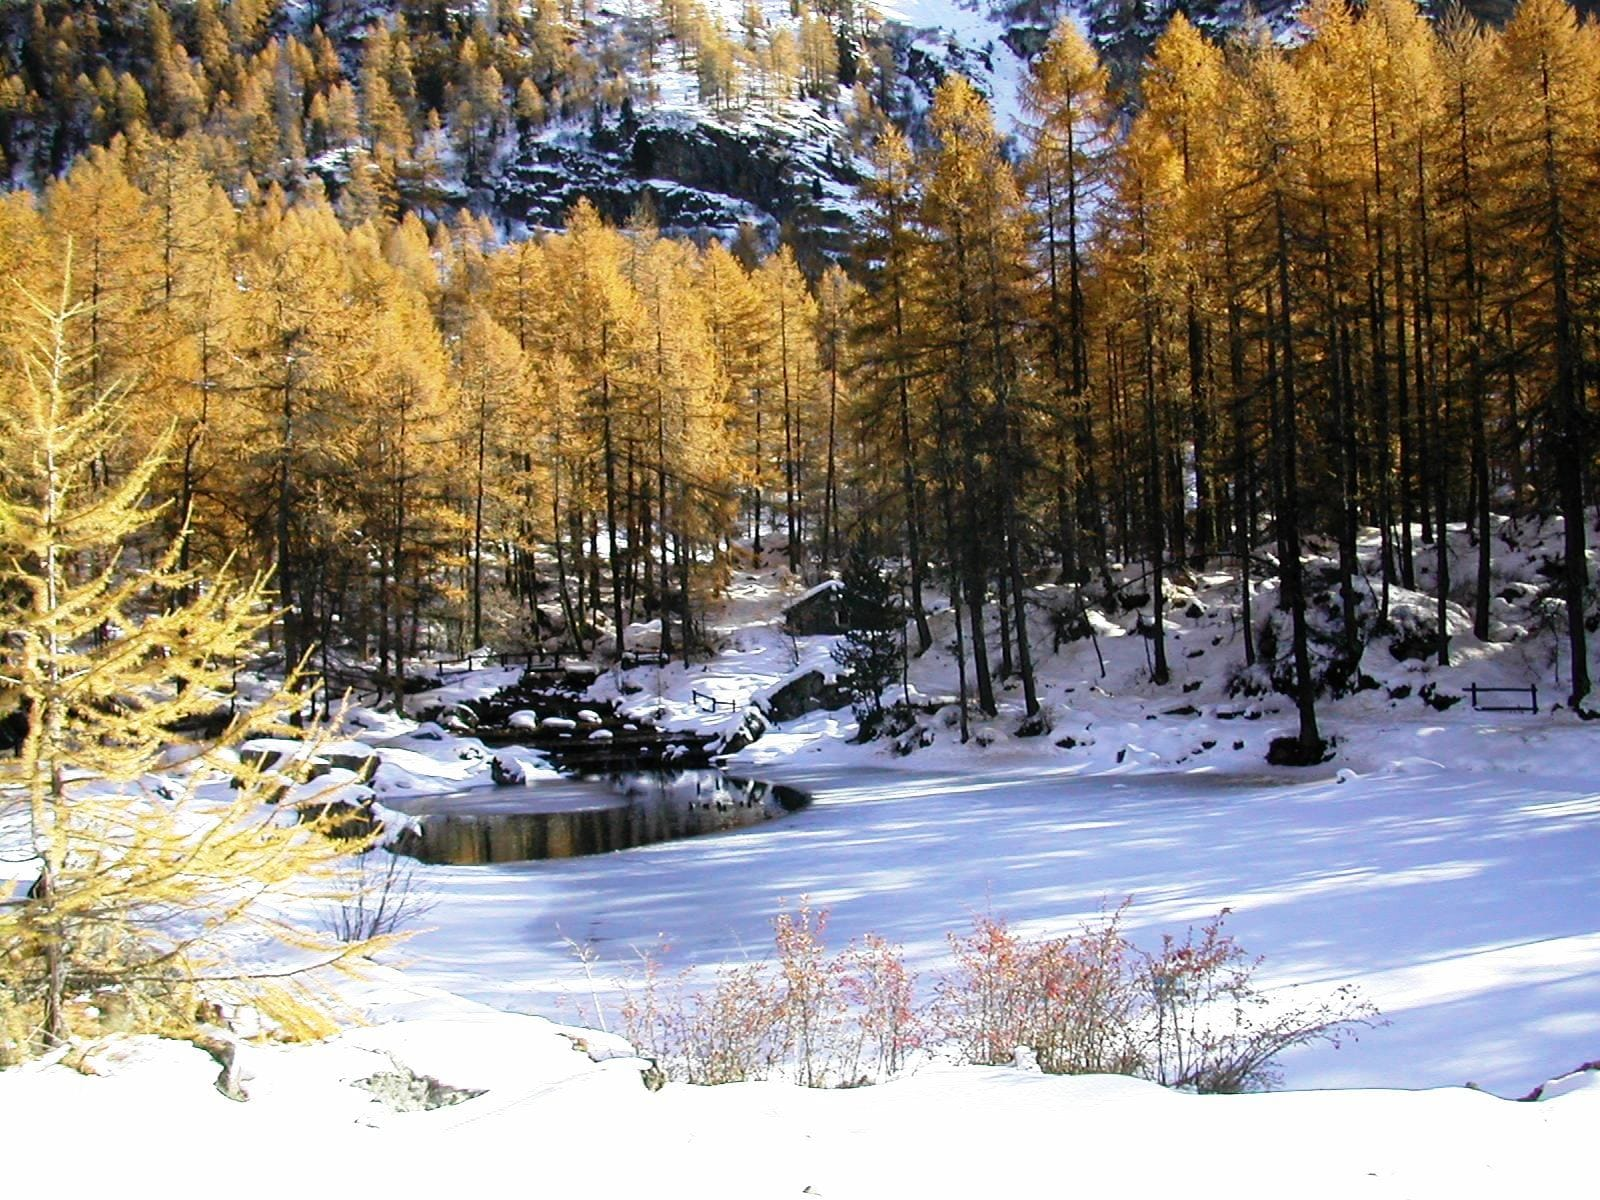 laghetto-pellaud-autunno-inverno